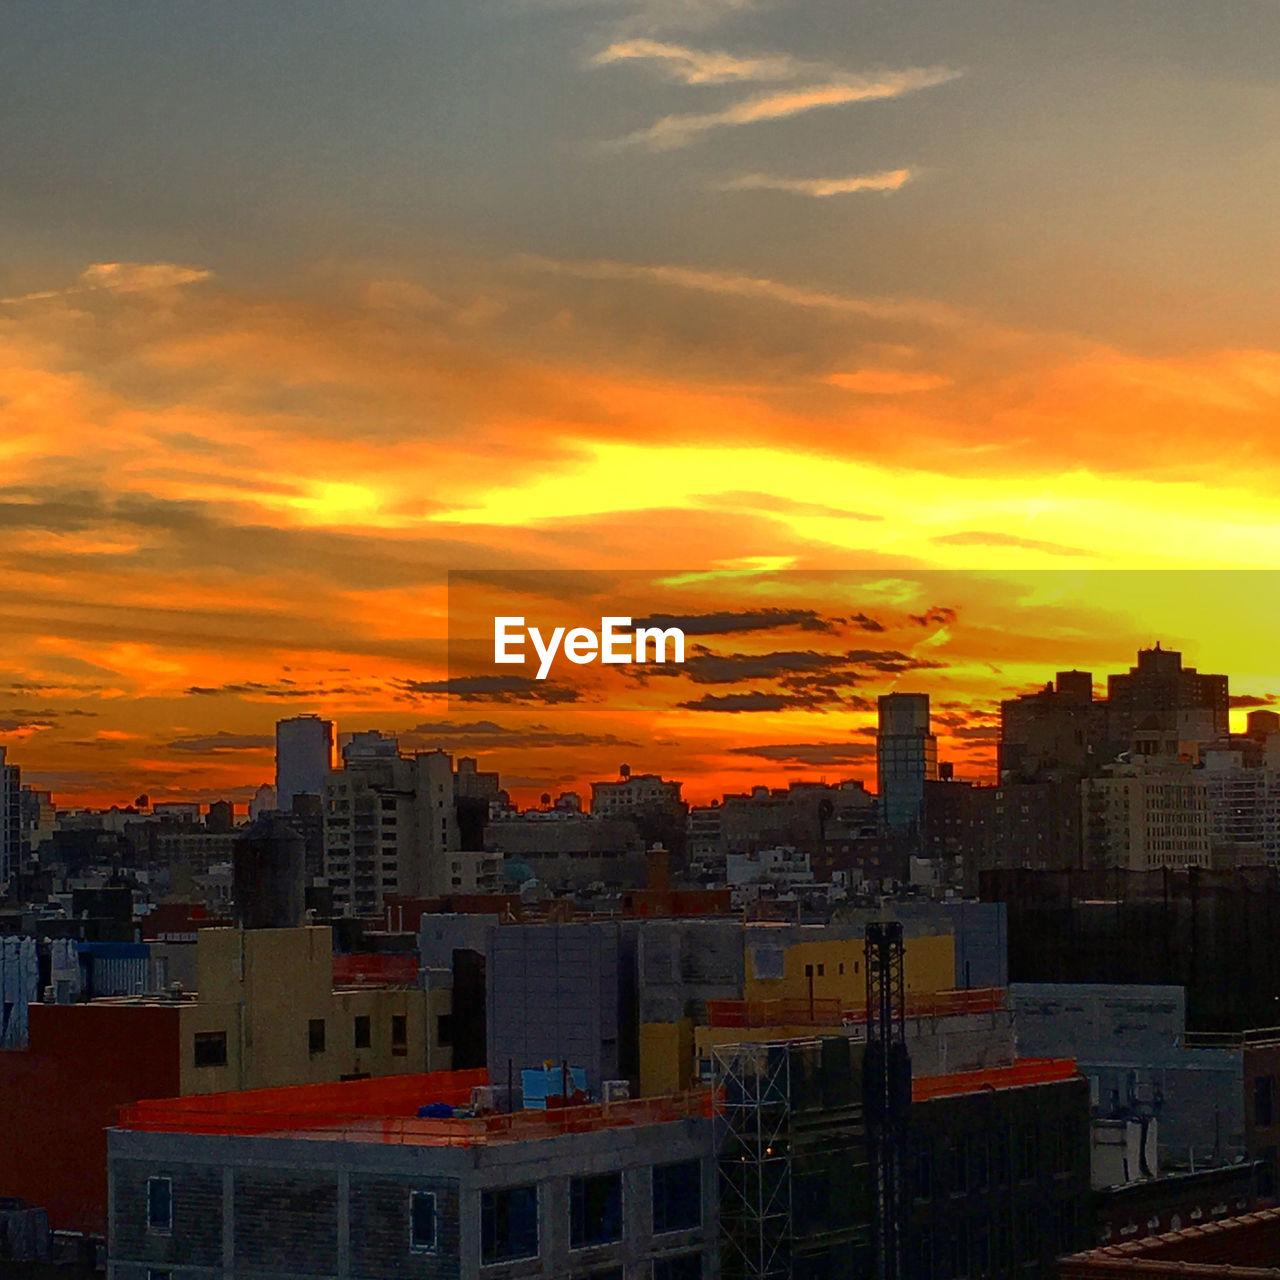 sunset, orange color, architecture, building exterior, cityscape, city, built structure, sky, skyscraper, no people, city life, cloud - sky, outdoors, urban skyline, nature